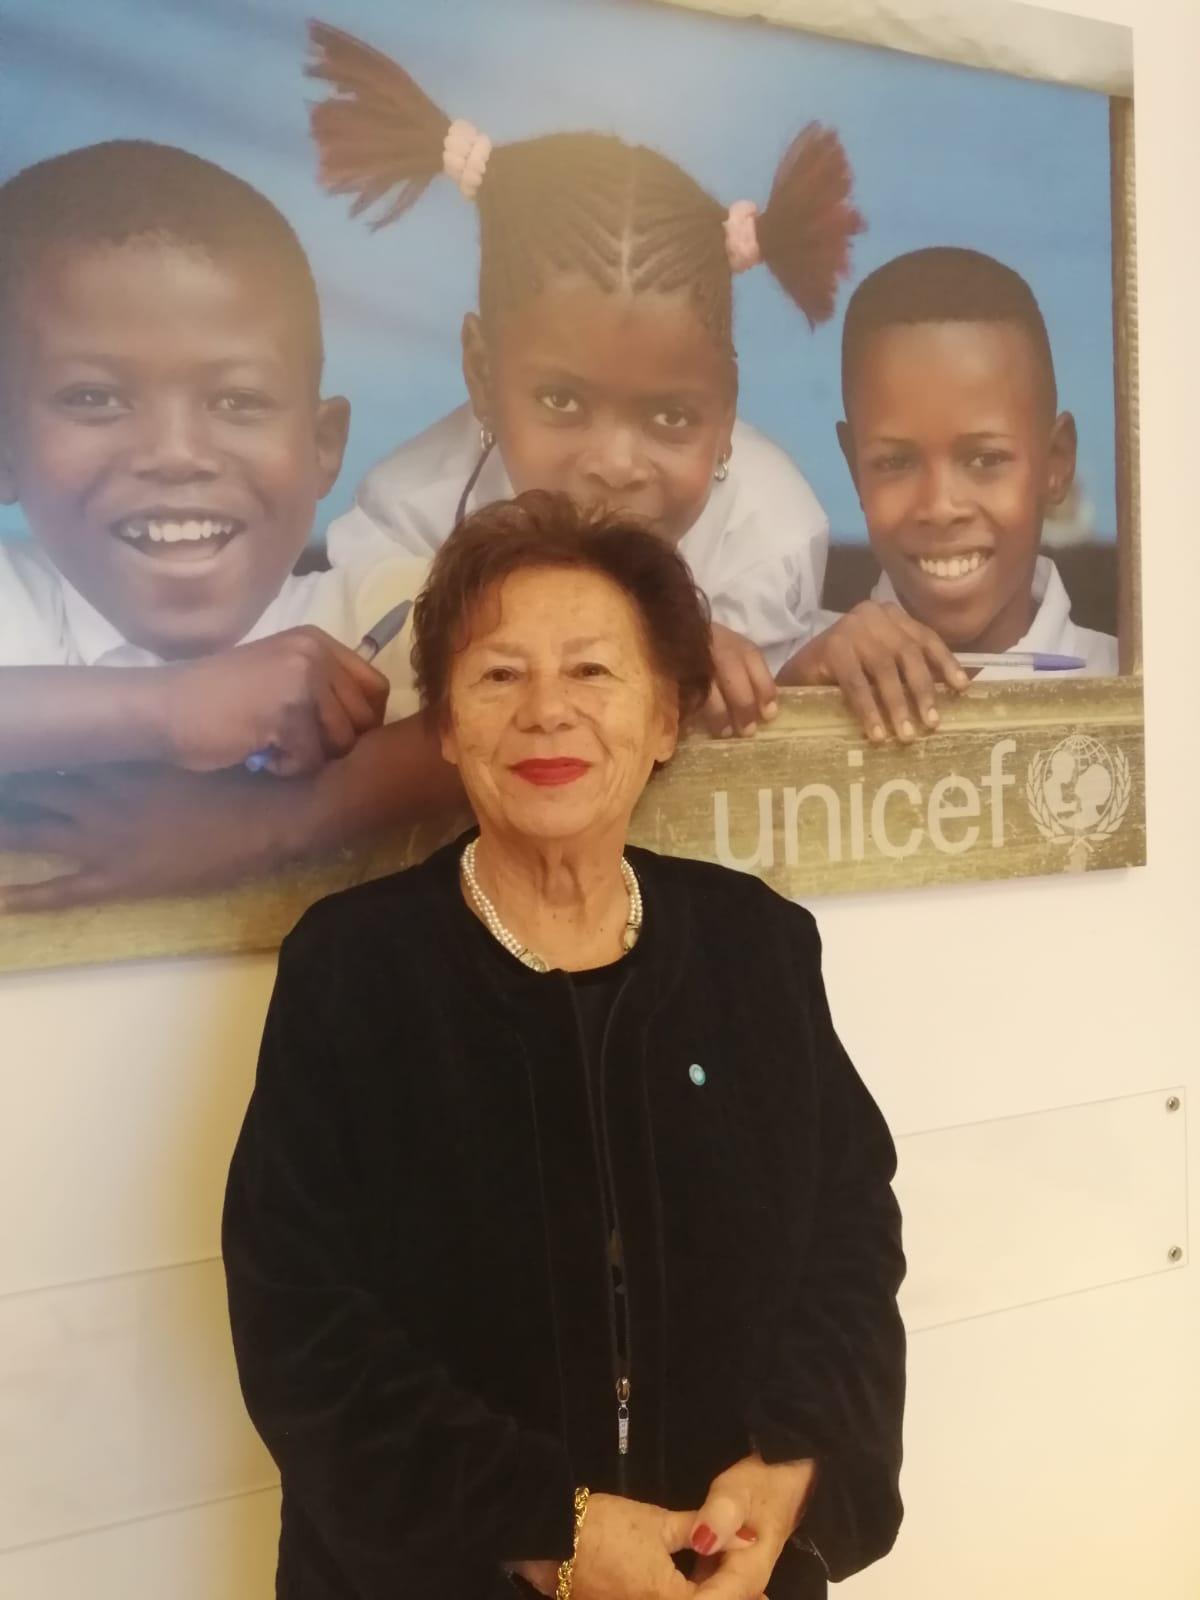 UNICEF Italia: Carmela Pace prima donna presidente - OnuItalia